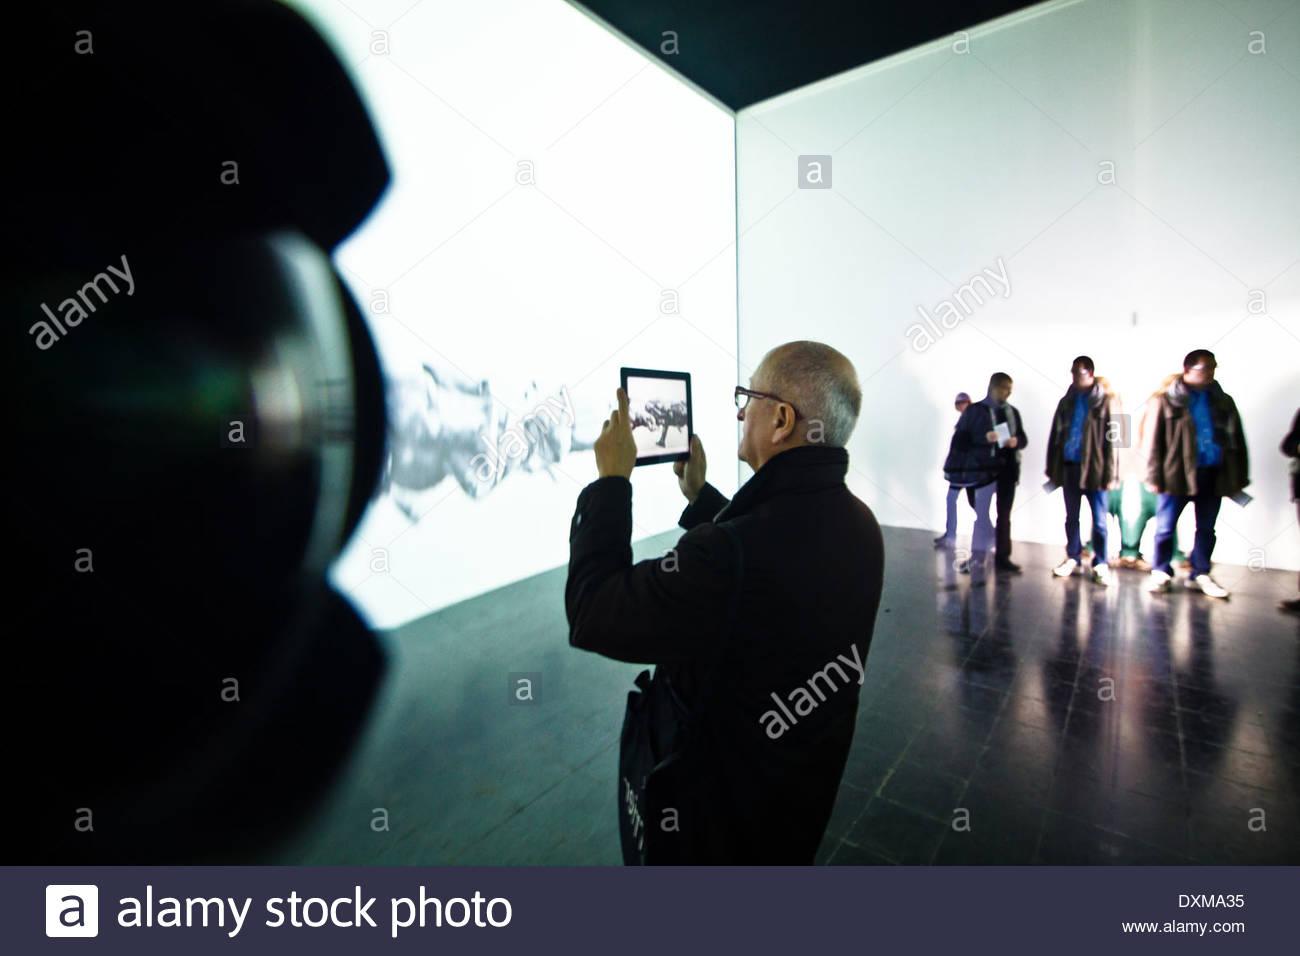 Italy, Veneto, Venice, Biennale of Architecture - Stock Image